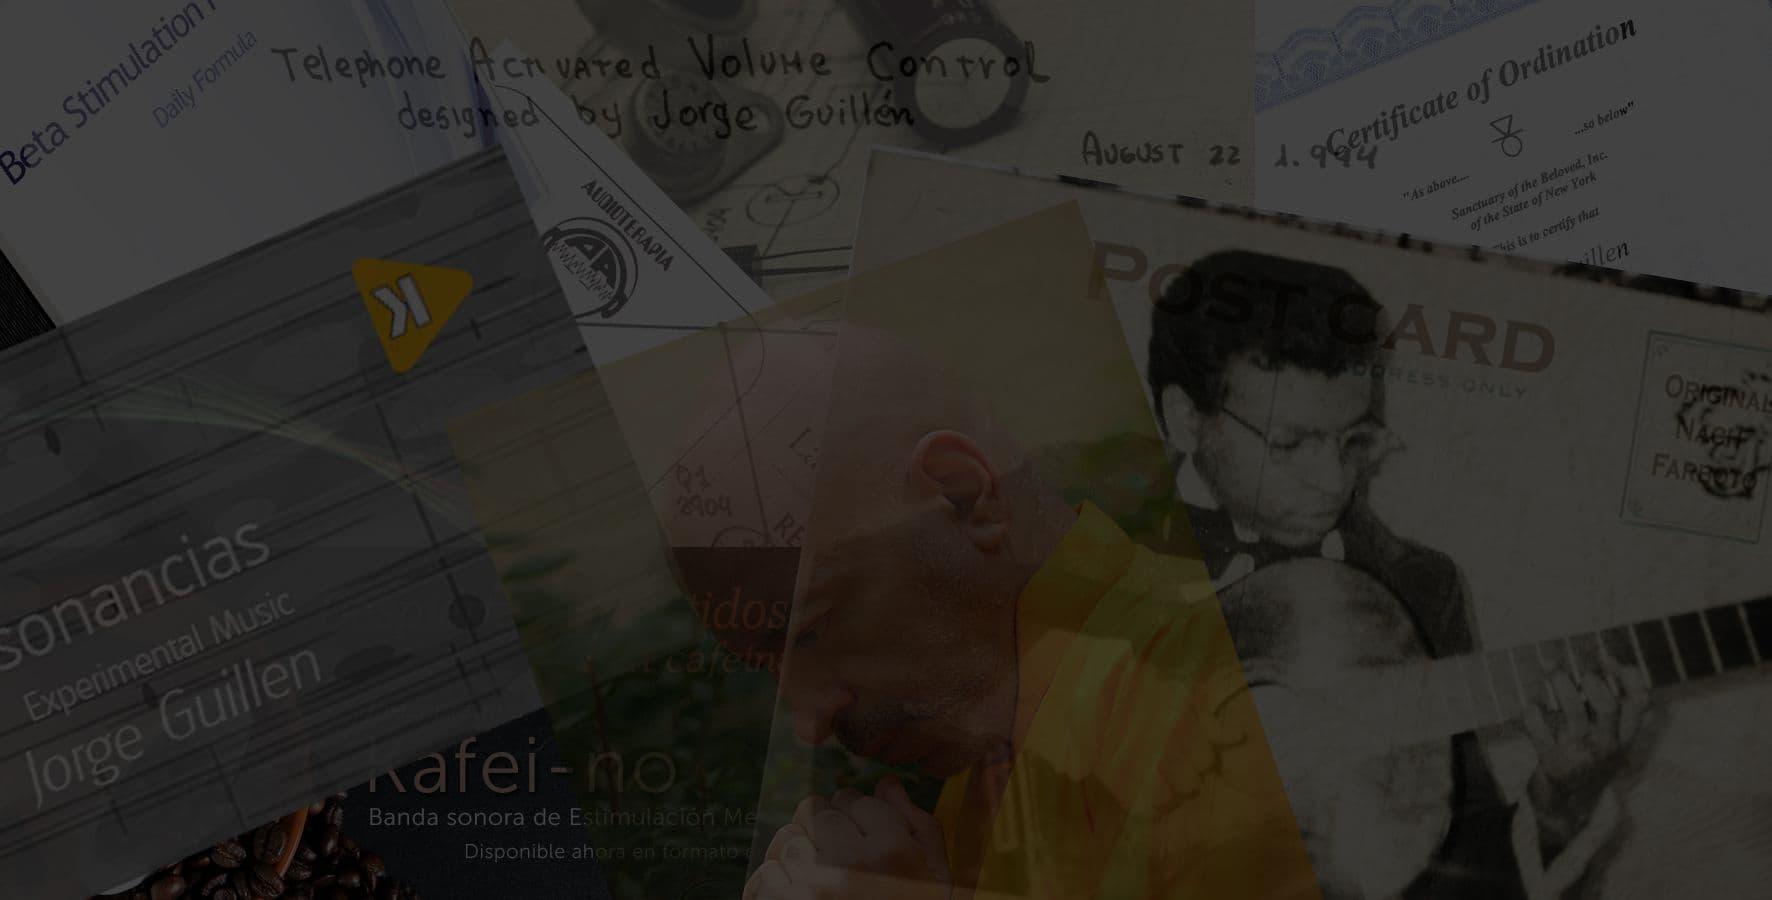 8038d02b3527 Jorge Guillen classical guitarist composer educator technologist and ...